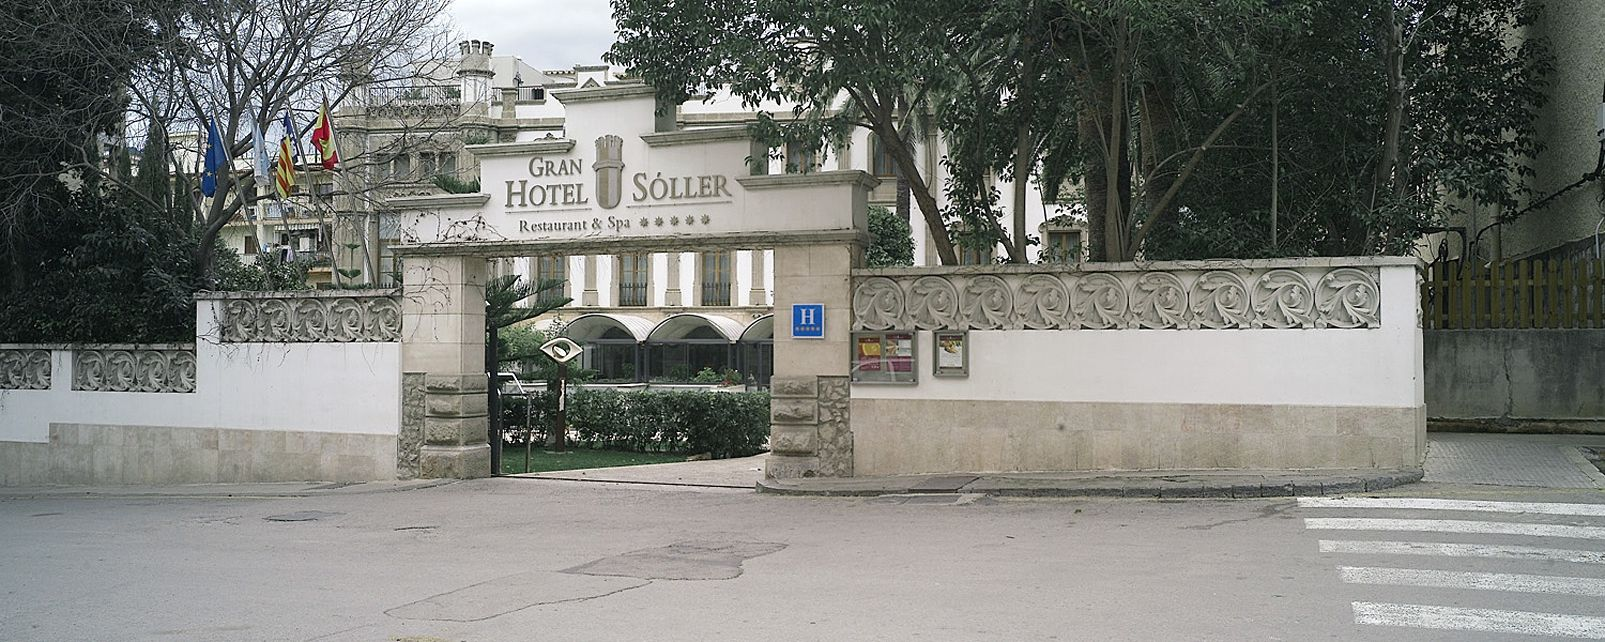 Hôtel Gran Soller